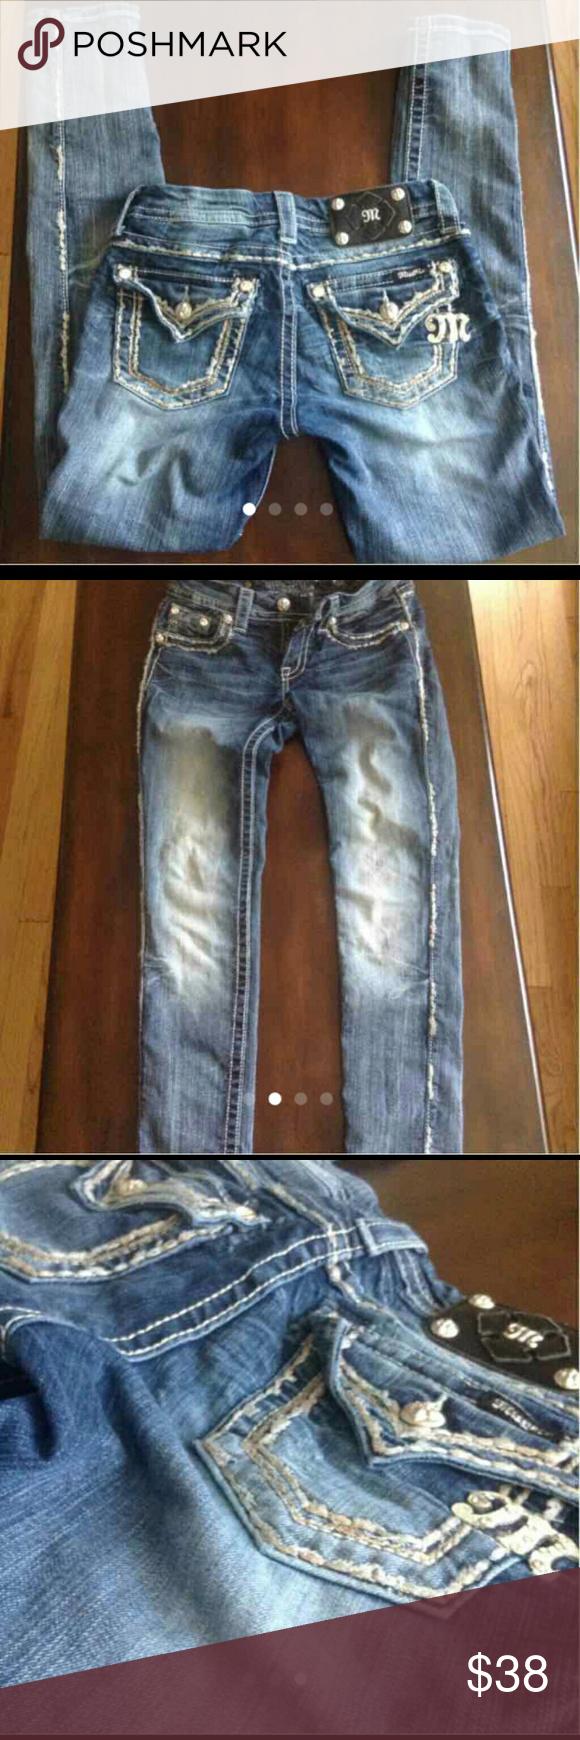 Miss me cuffed skinny Size 26 28 inseam Cheaper deal on m e r c a r i Miss Me Pants